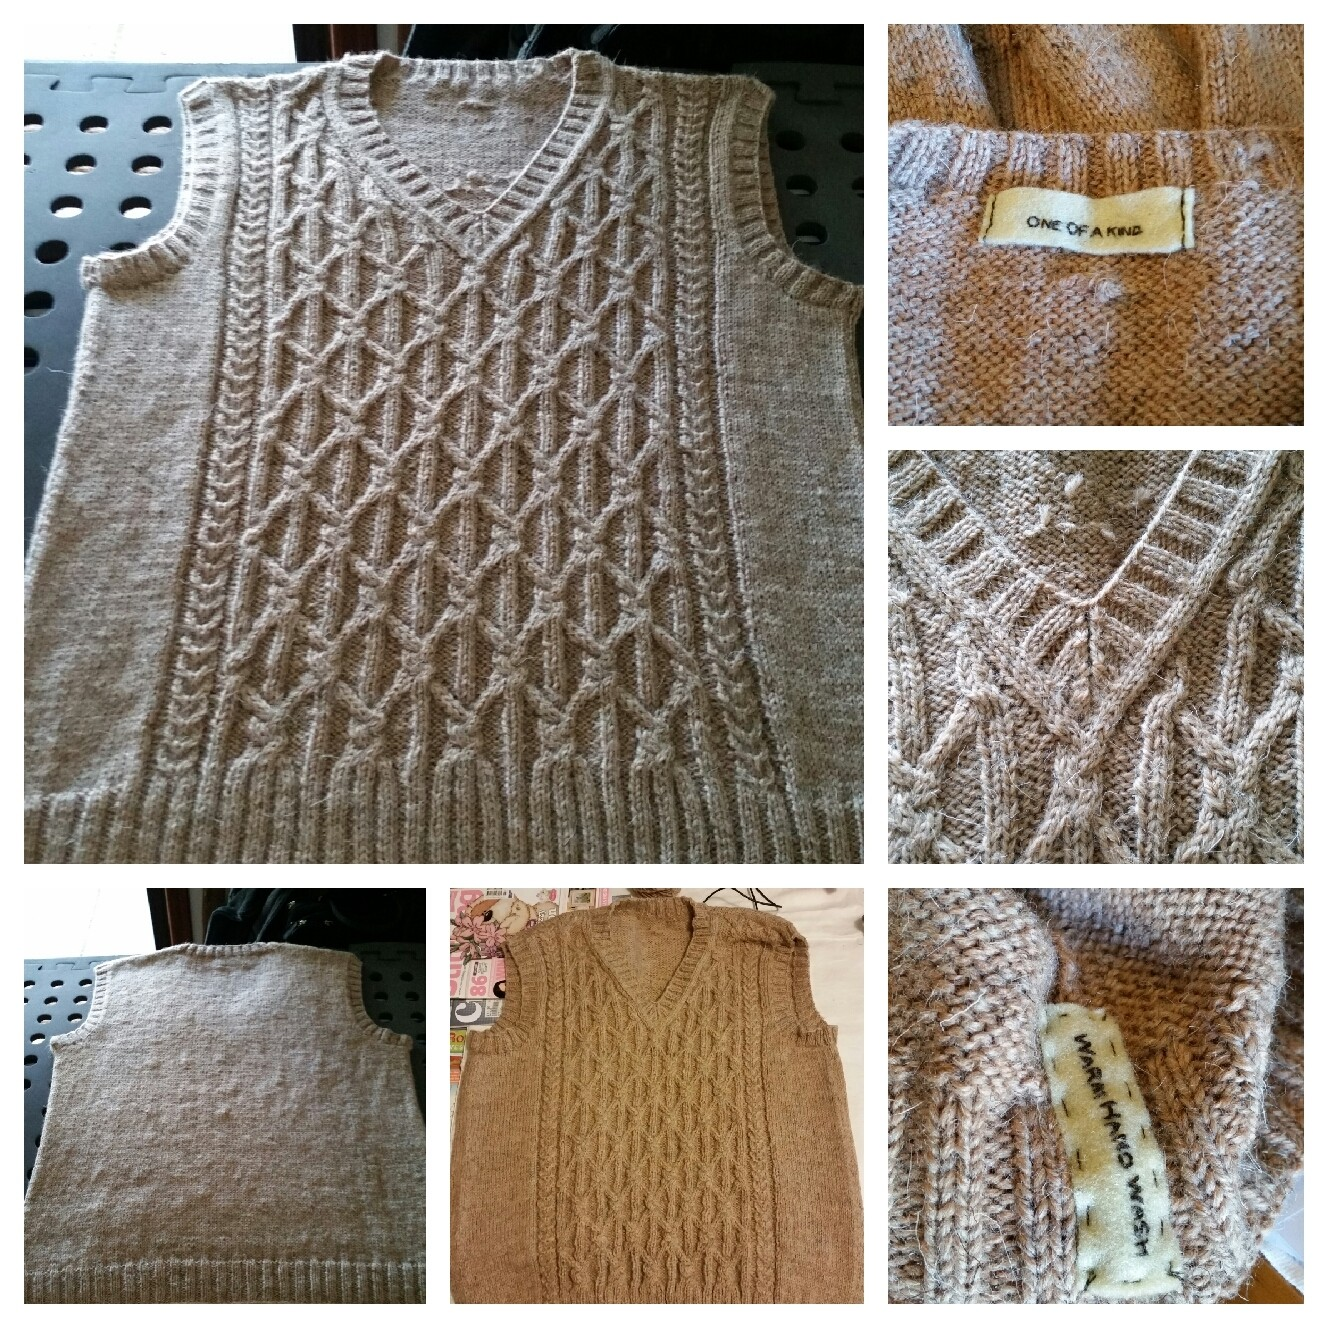 Cabled vest -part two